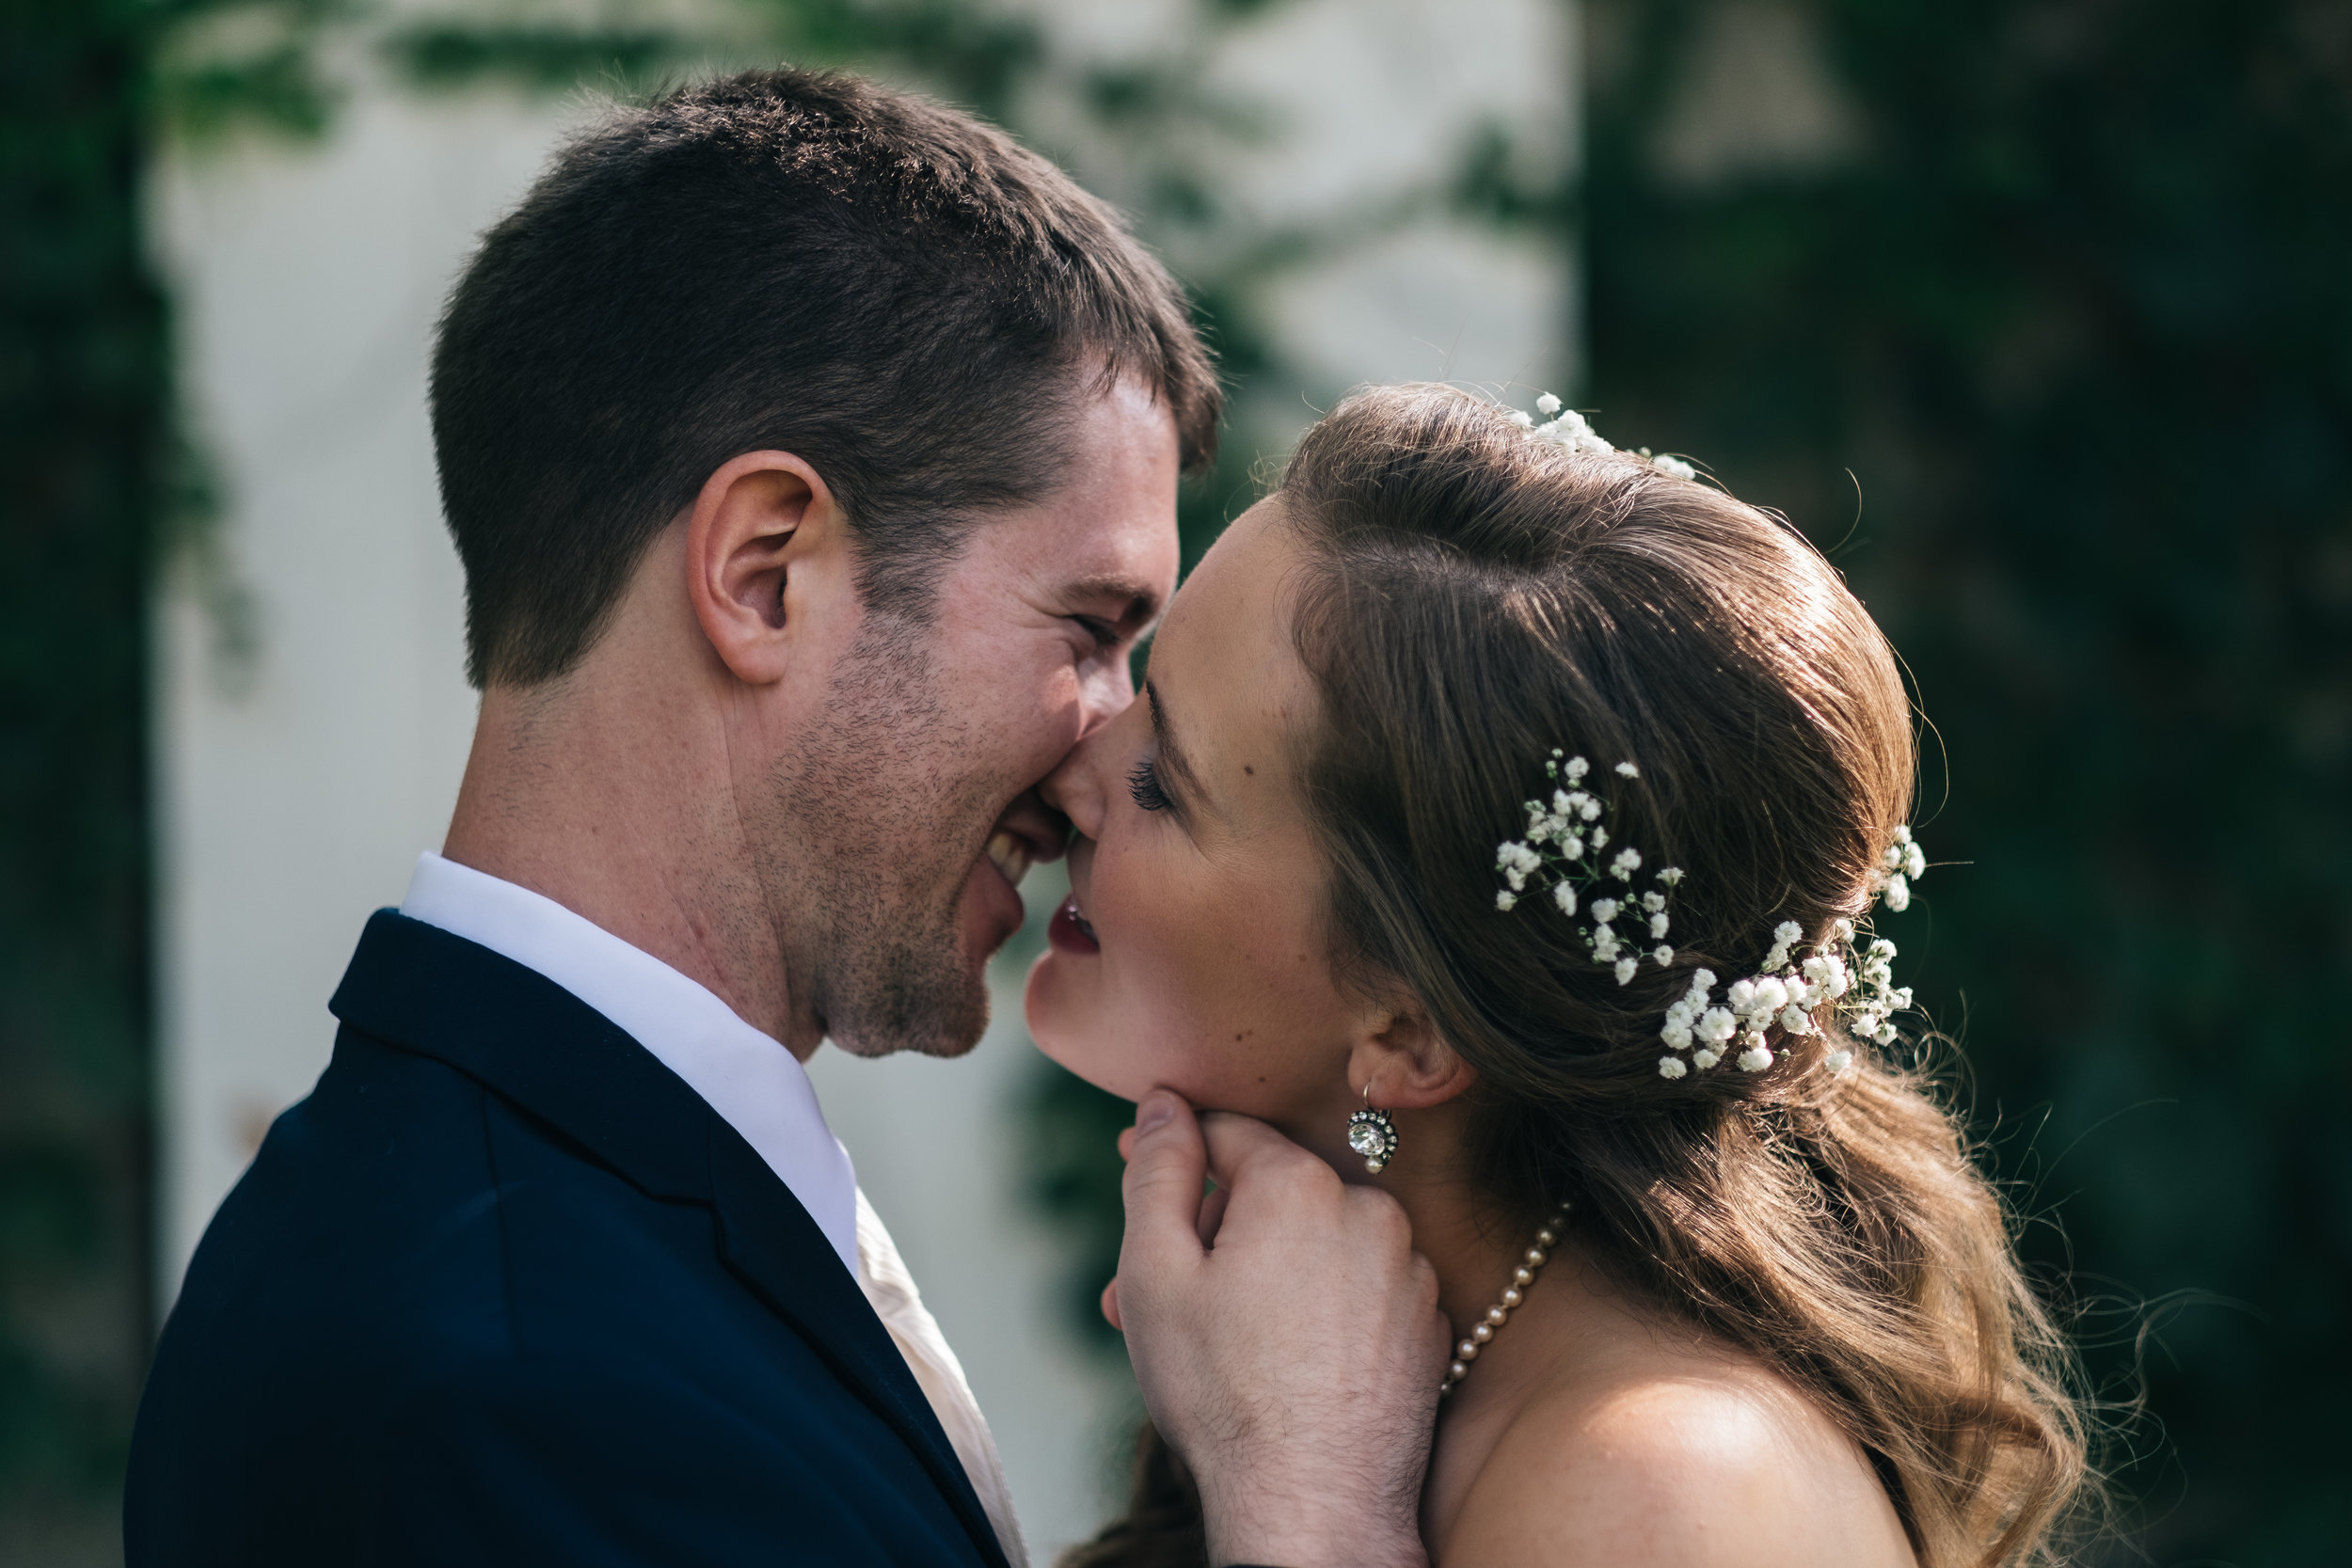 Wedding photography of bride and groom.